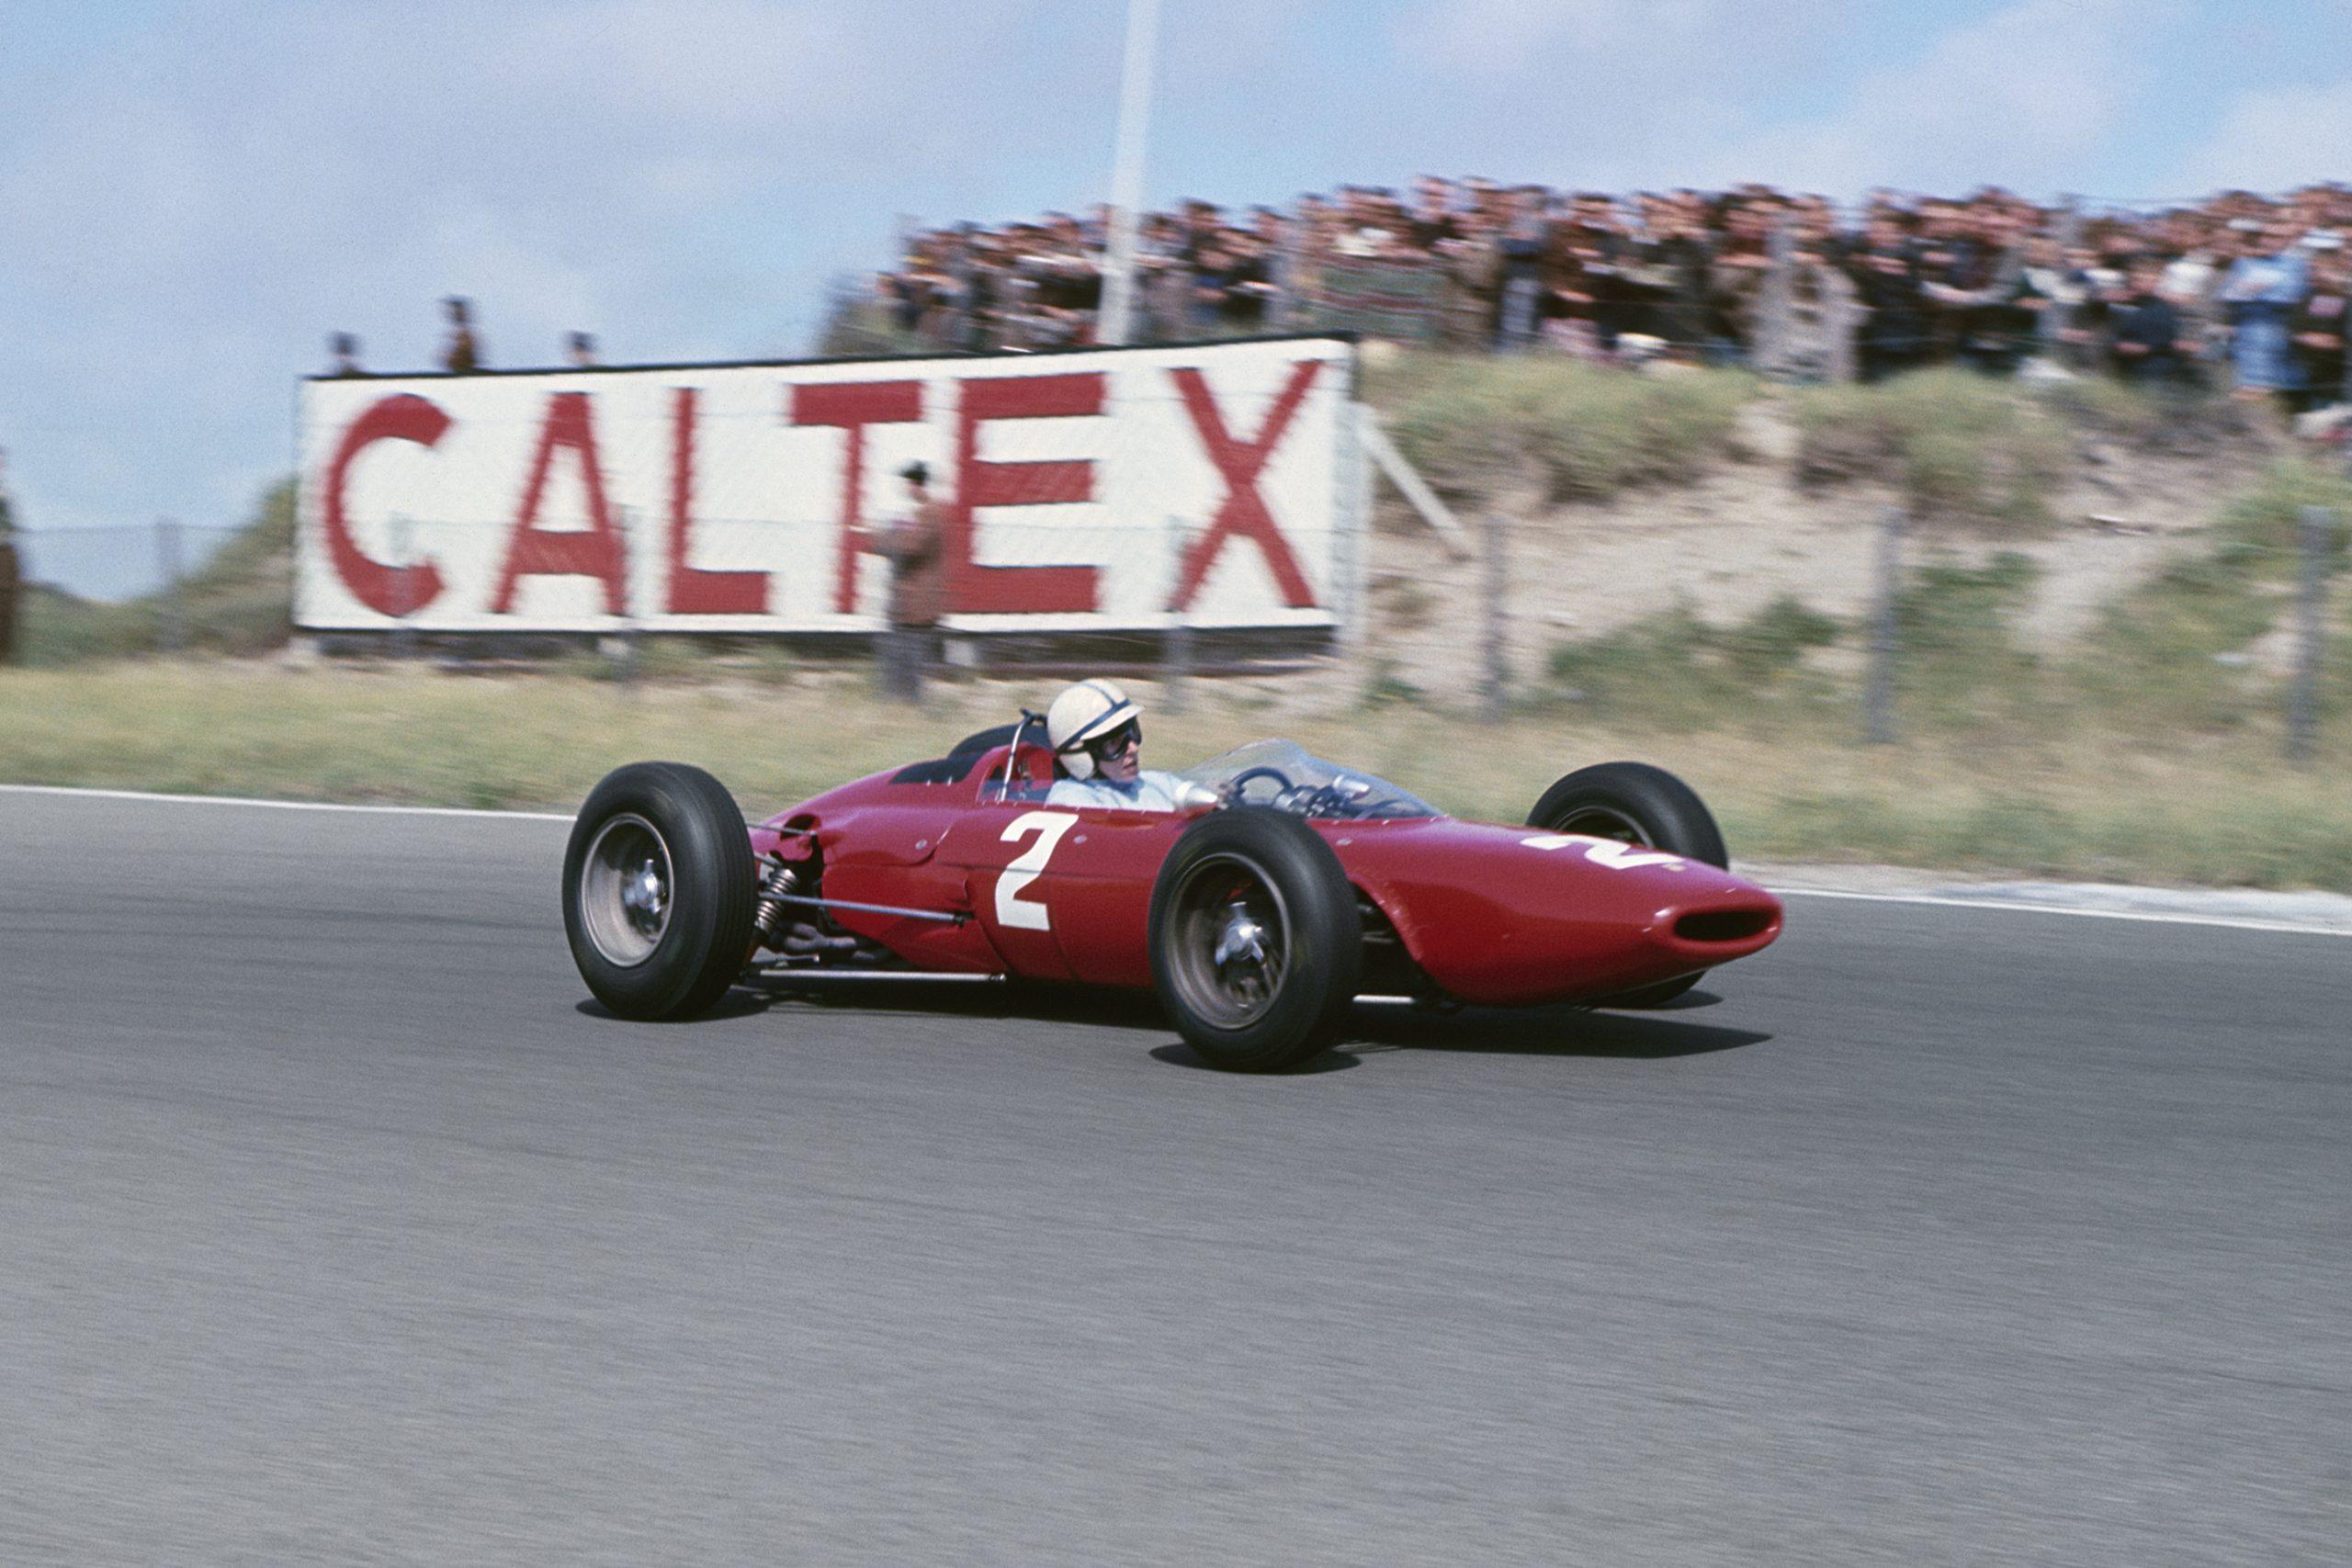 John Surtees at the wheel of his Ferrari Dino 156.